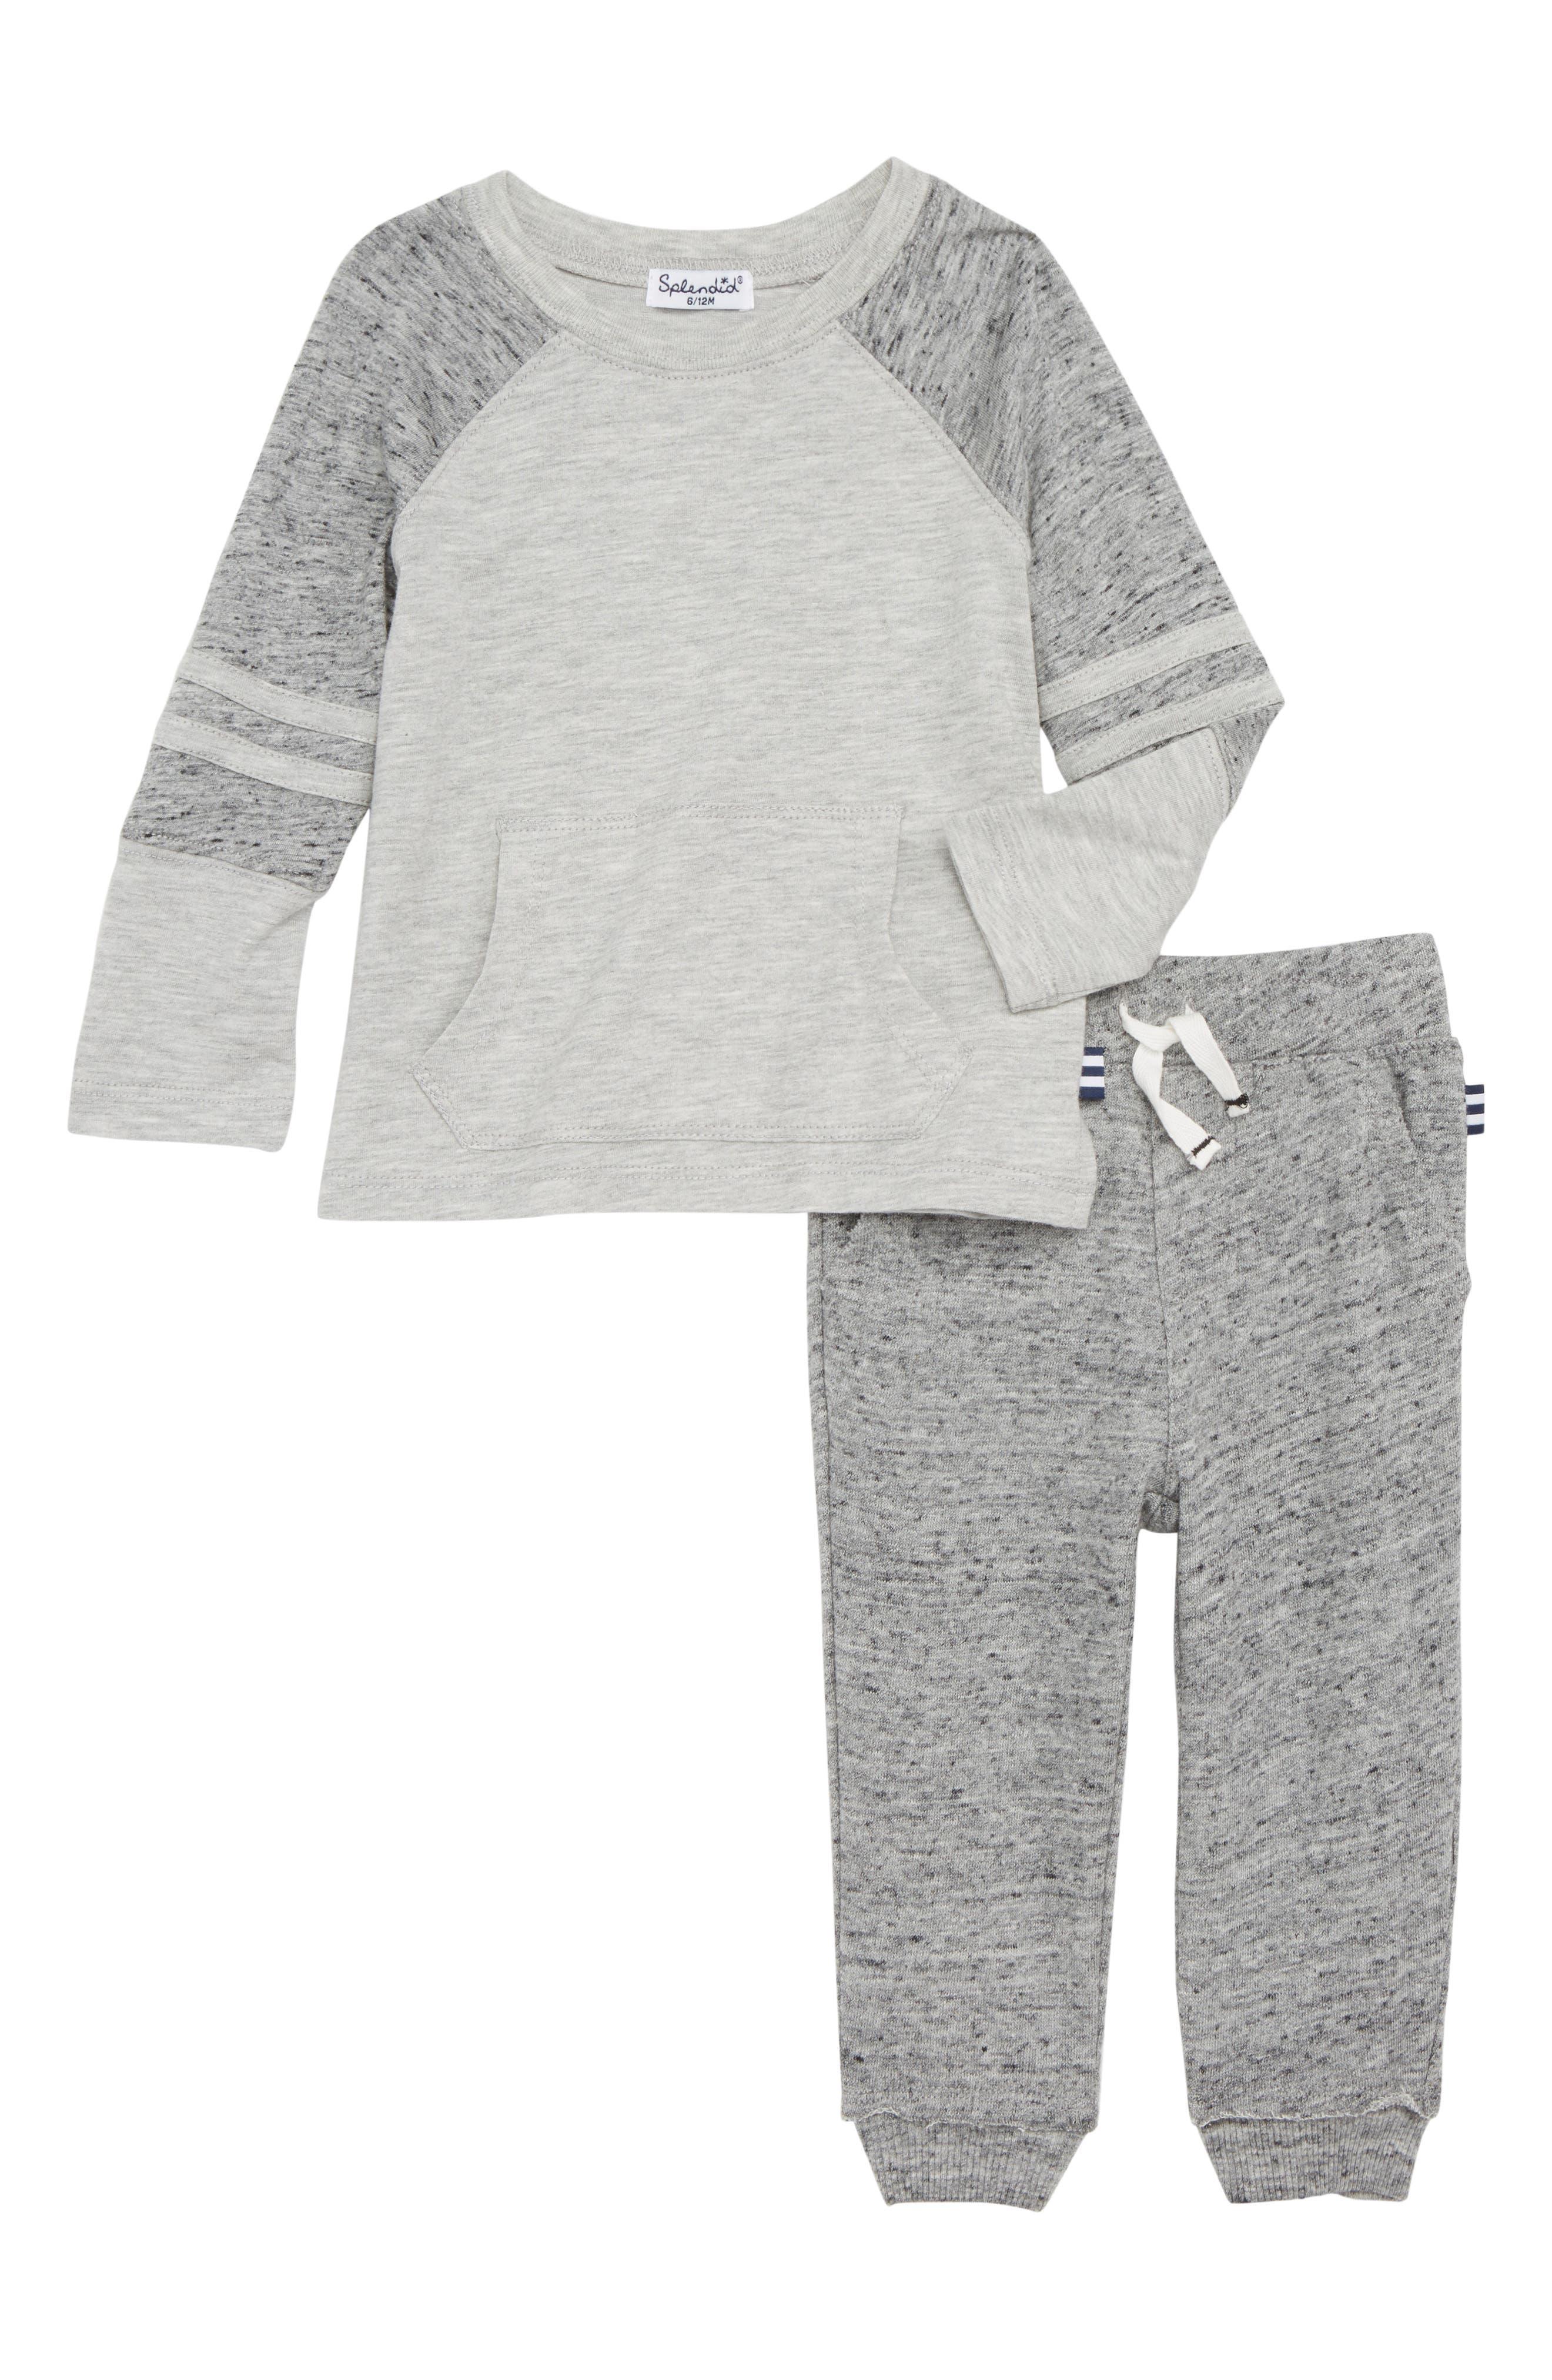 Raglan T-Shirt & Sweatpants Set,                         Main,                         color, LIGHT GREY HEATHER 051